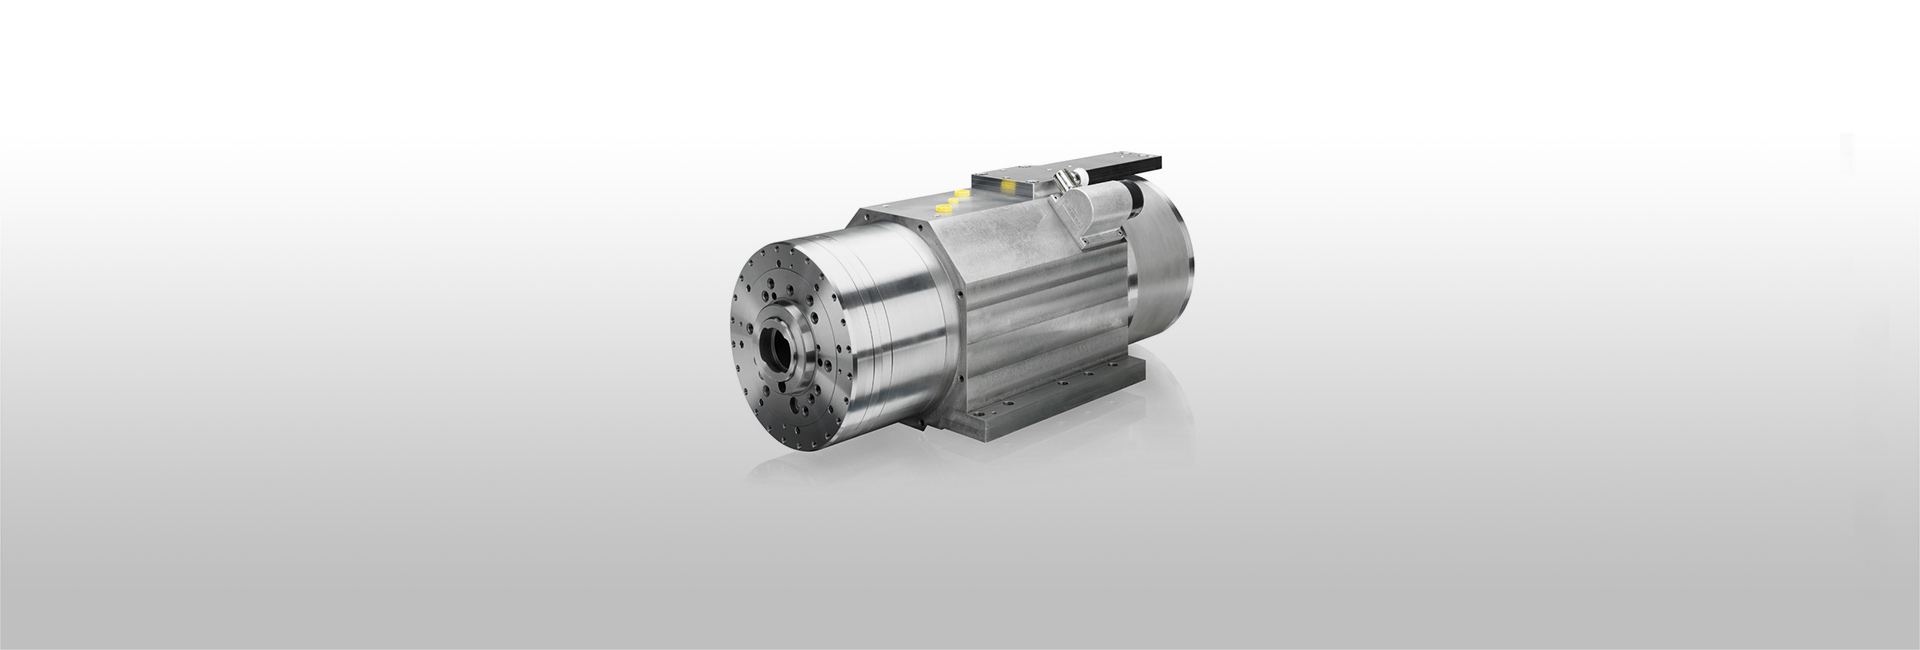 Dreh-Motorspindel SPL 2714.9 | SPL Spindel und Präszisionslager GmbH